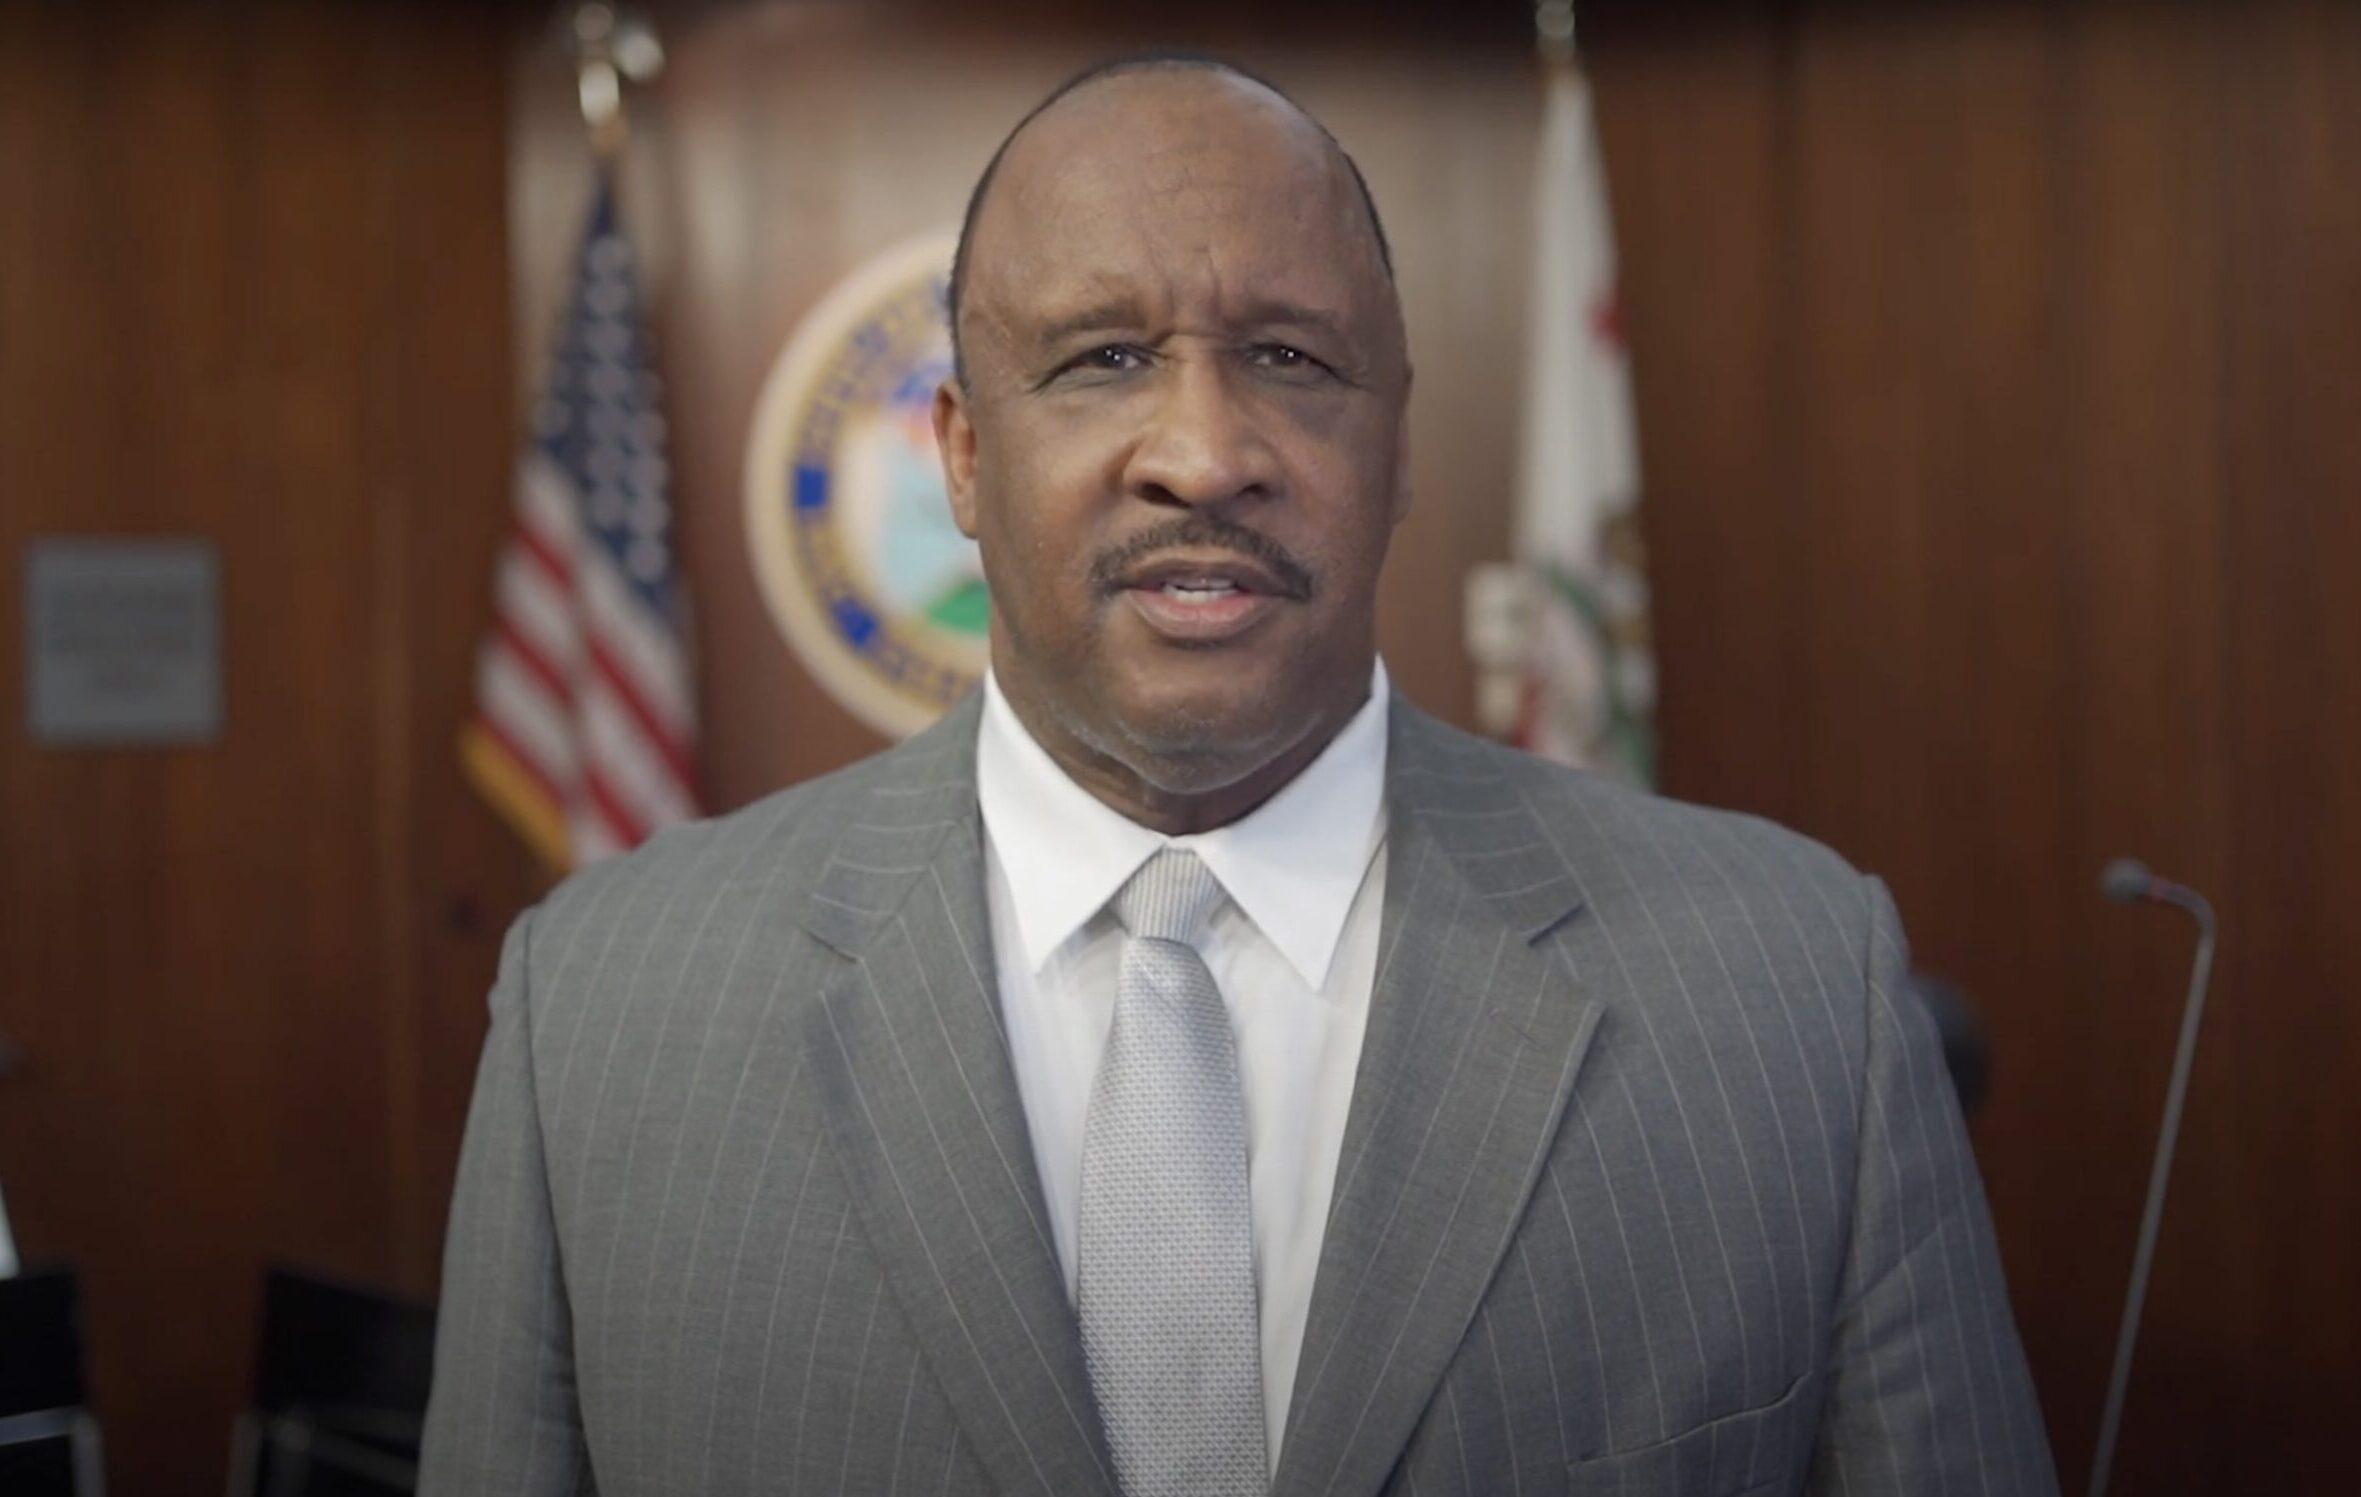 https://jamestbutts.com/wp-content/uploads/2020/08/MayorButts3-scaled-e1596837376757.jpg